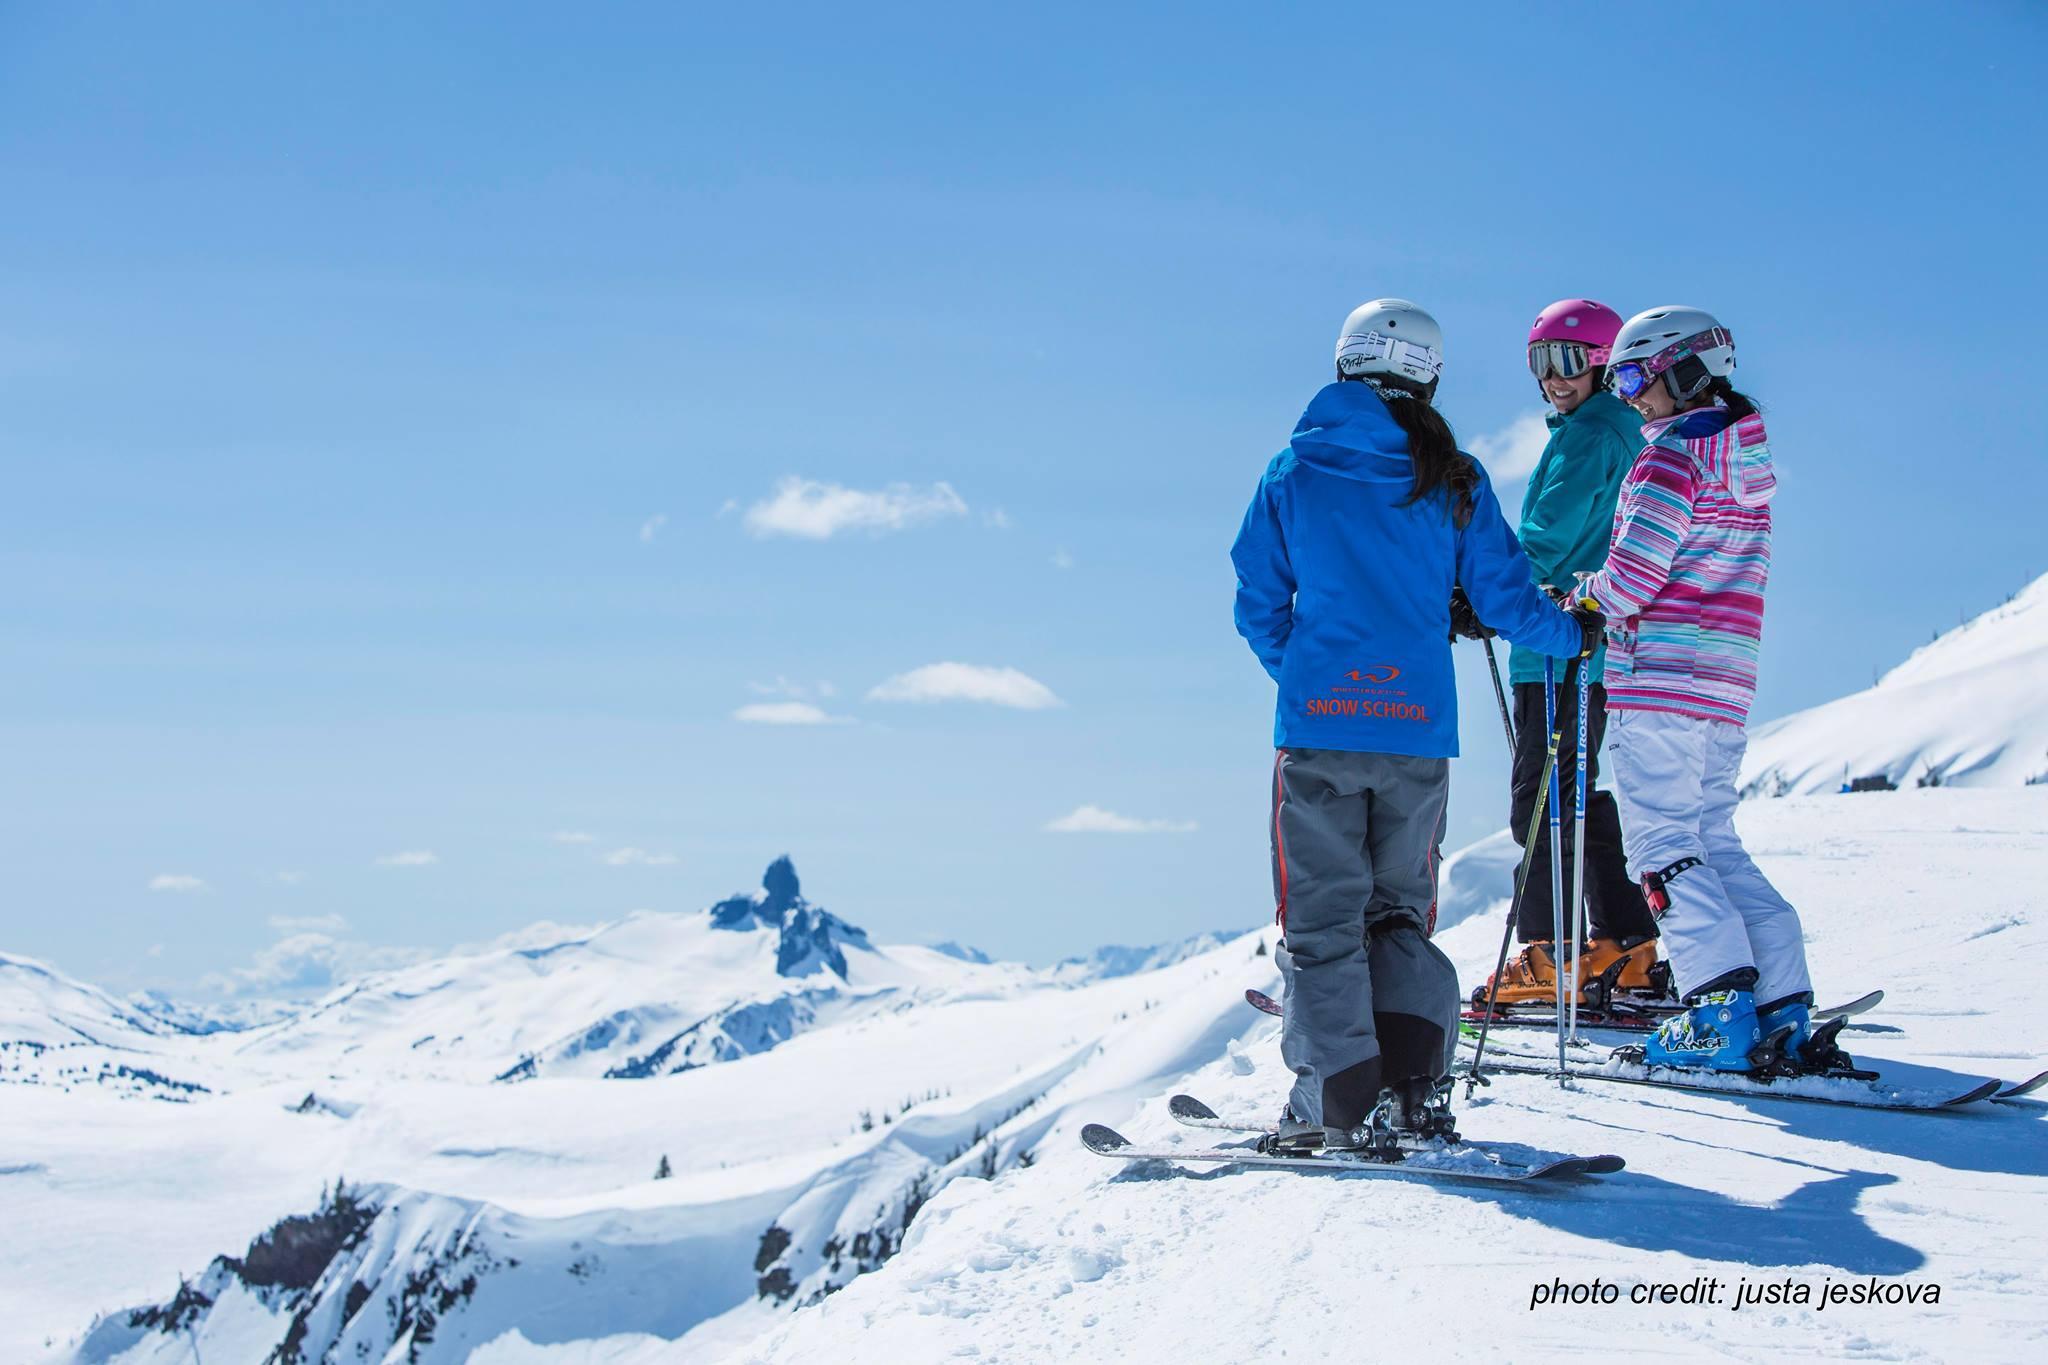 Ski and Snowboard School - Whistler Blackcomb